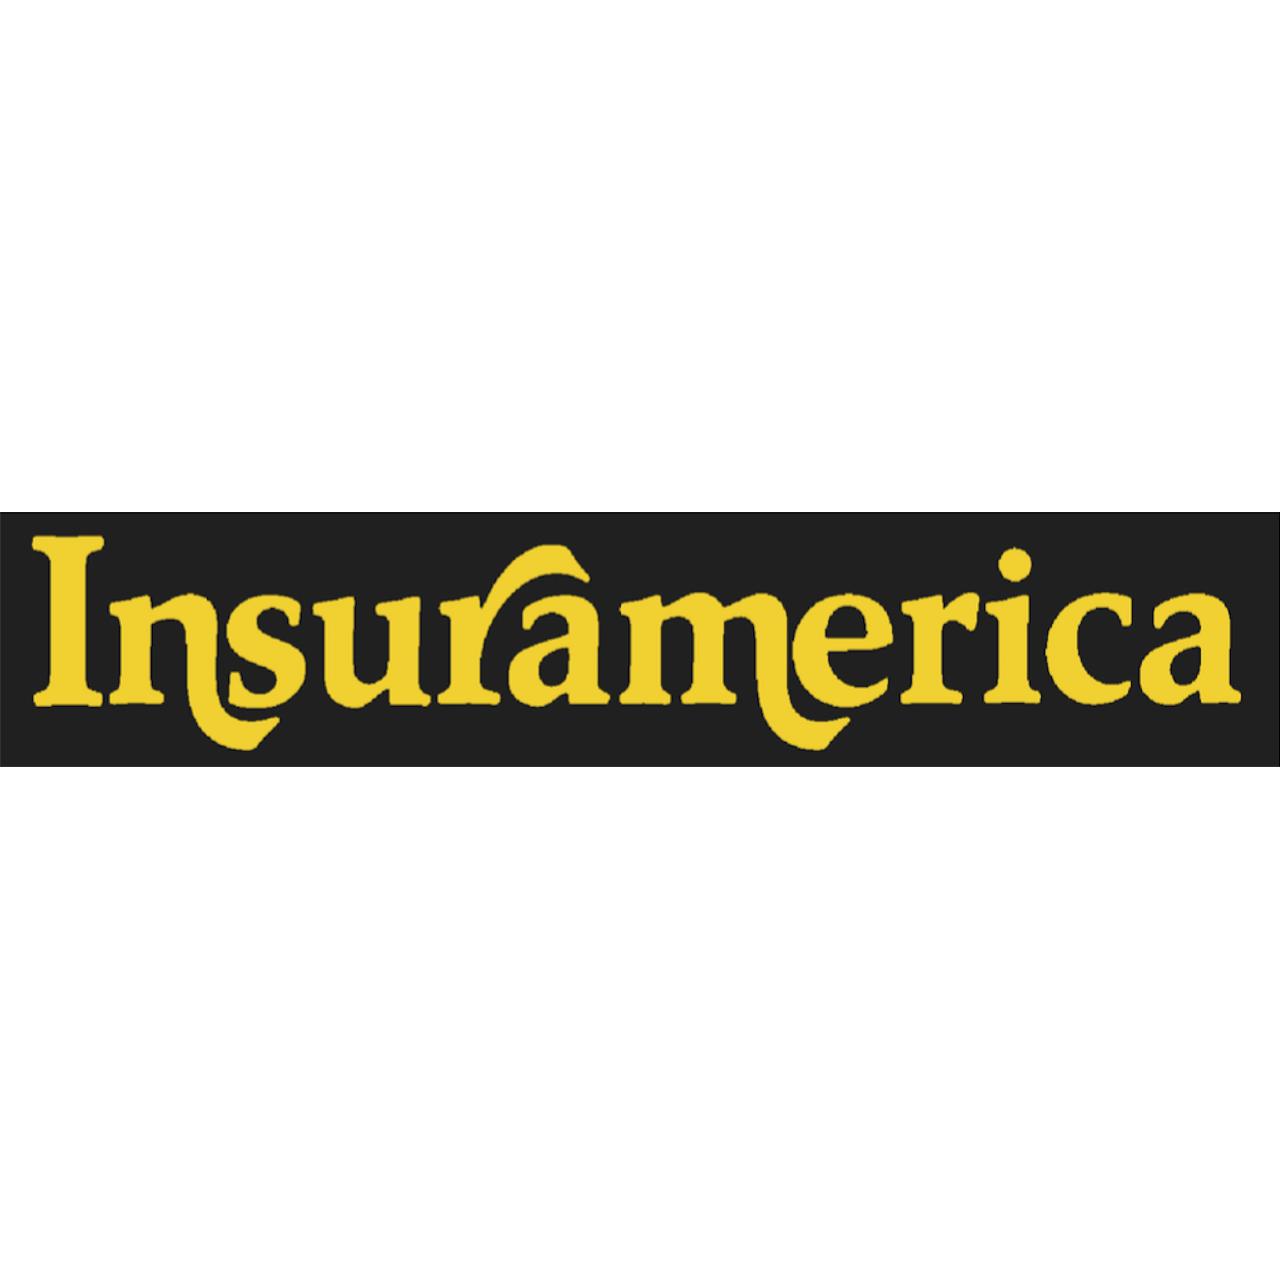 Insuramerica